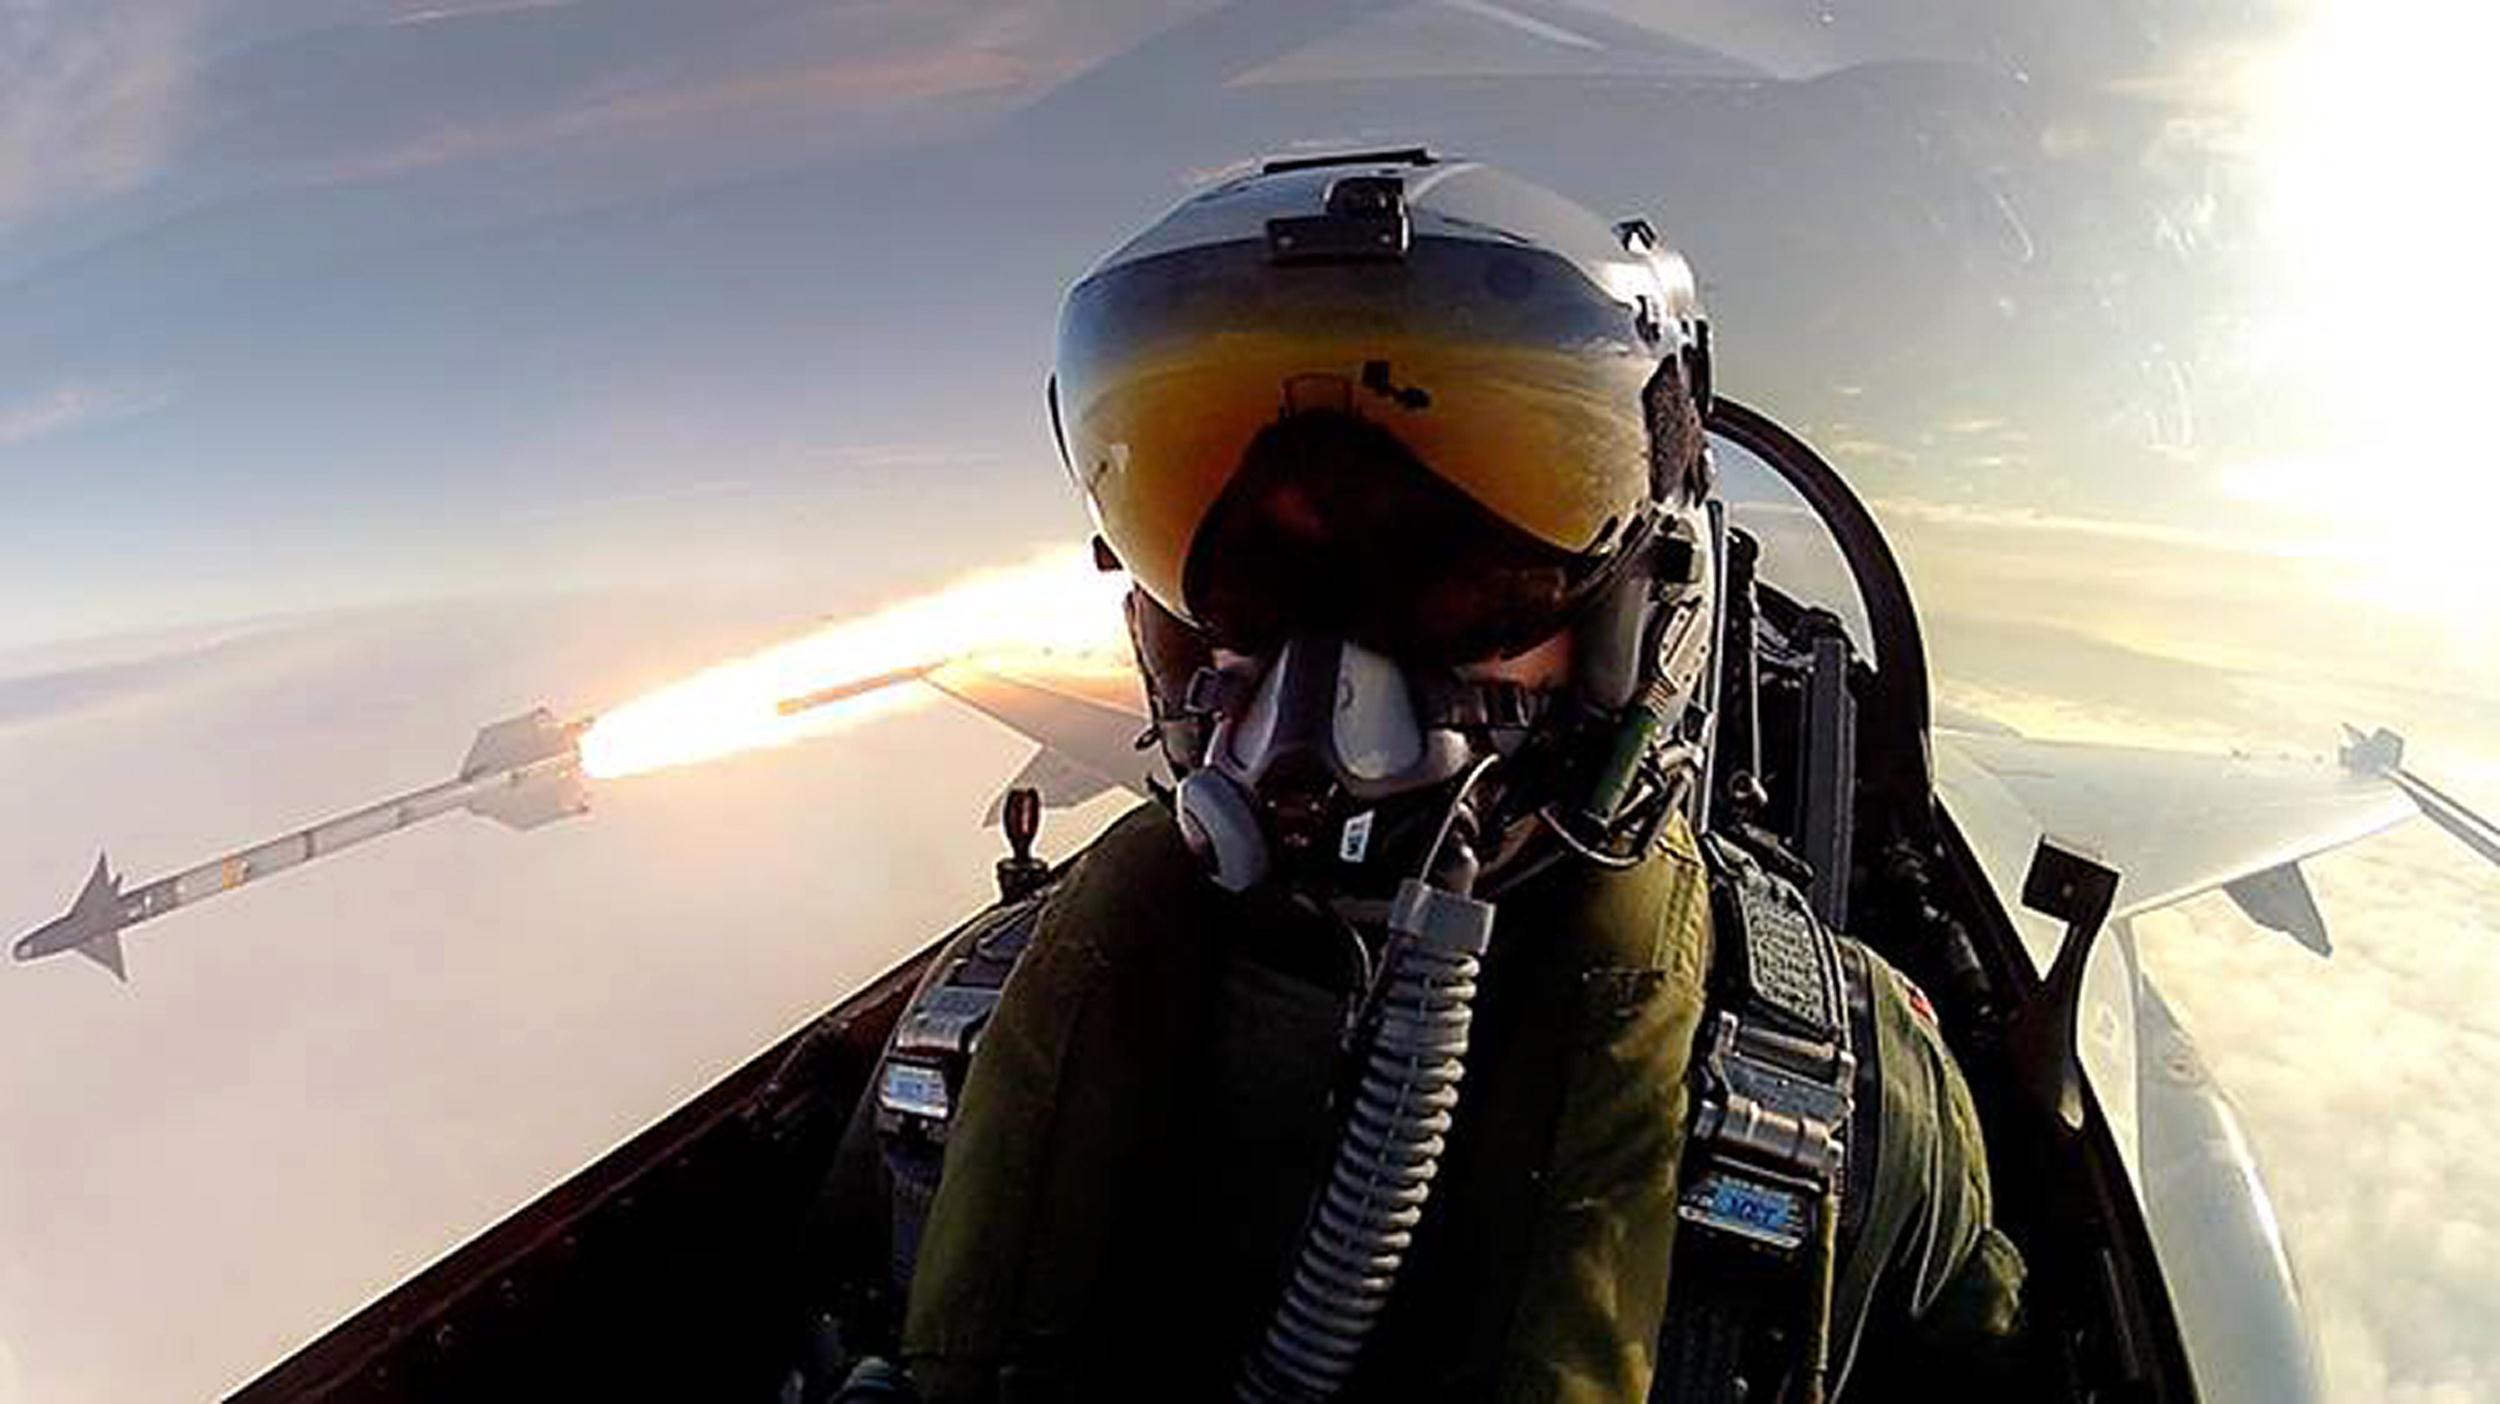 Royal Danish Air Force pilot Thomas Kristensen fires an AIM-9L air-to-air missile from his F-16 Fighting Falcon.